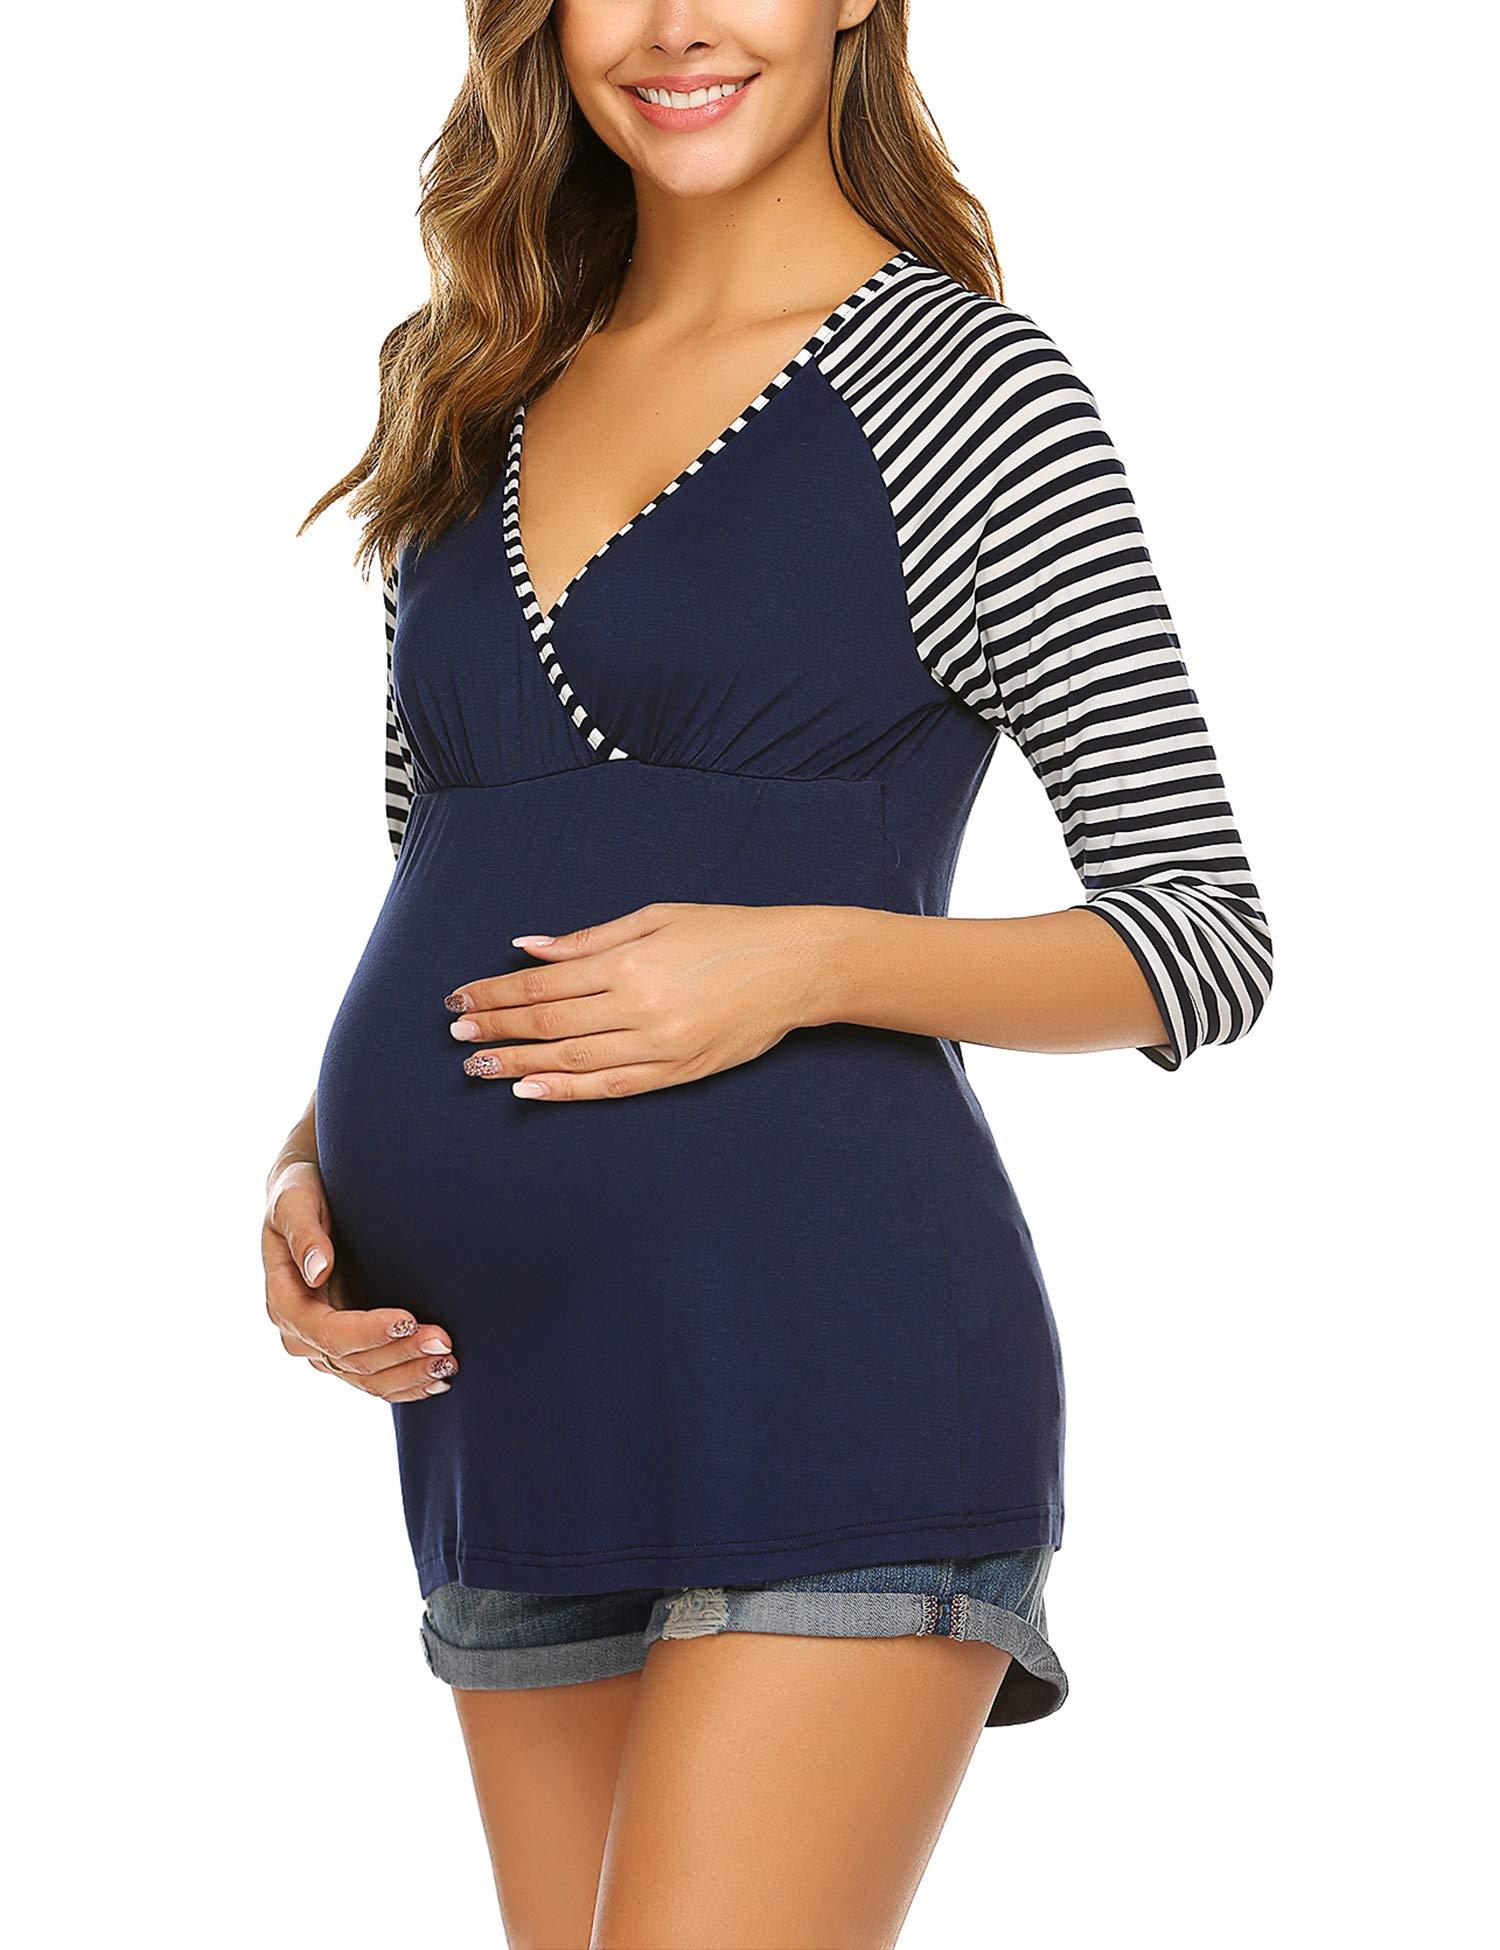 Ekouaer Women's 3/4 Sleeve Maternity Nursing Tops Stripe Patchwork Breastfeeding Shirts Tees (S-XXL)